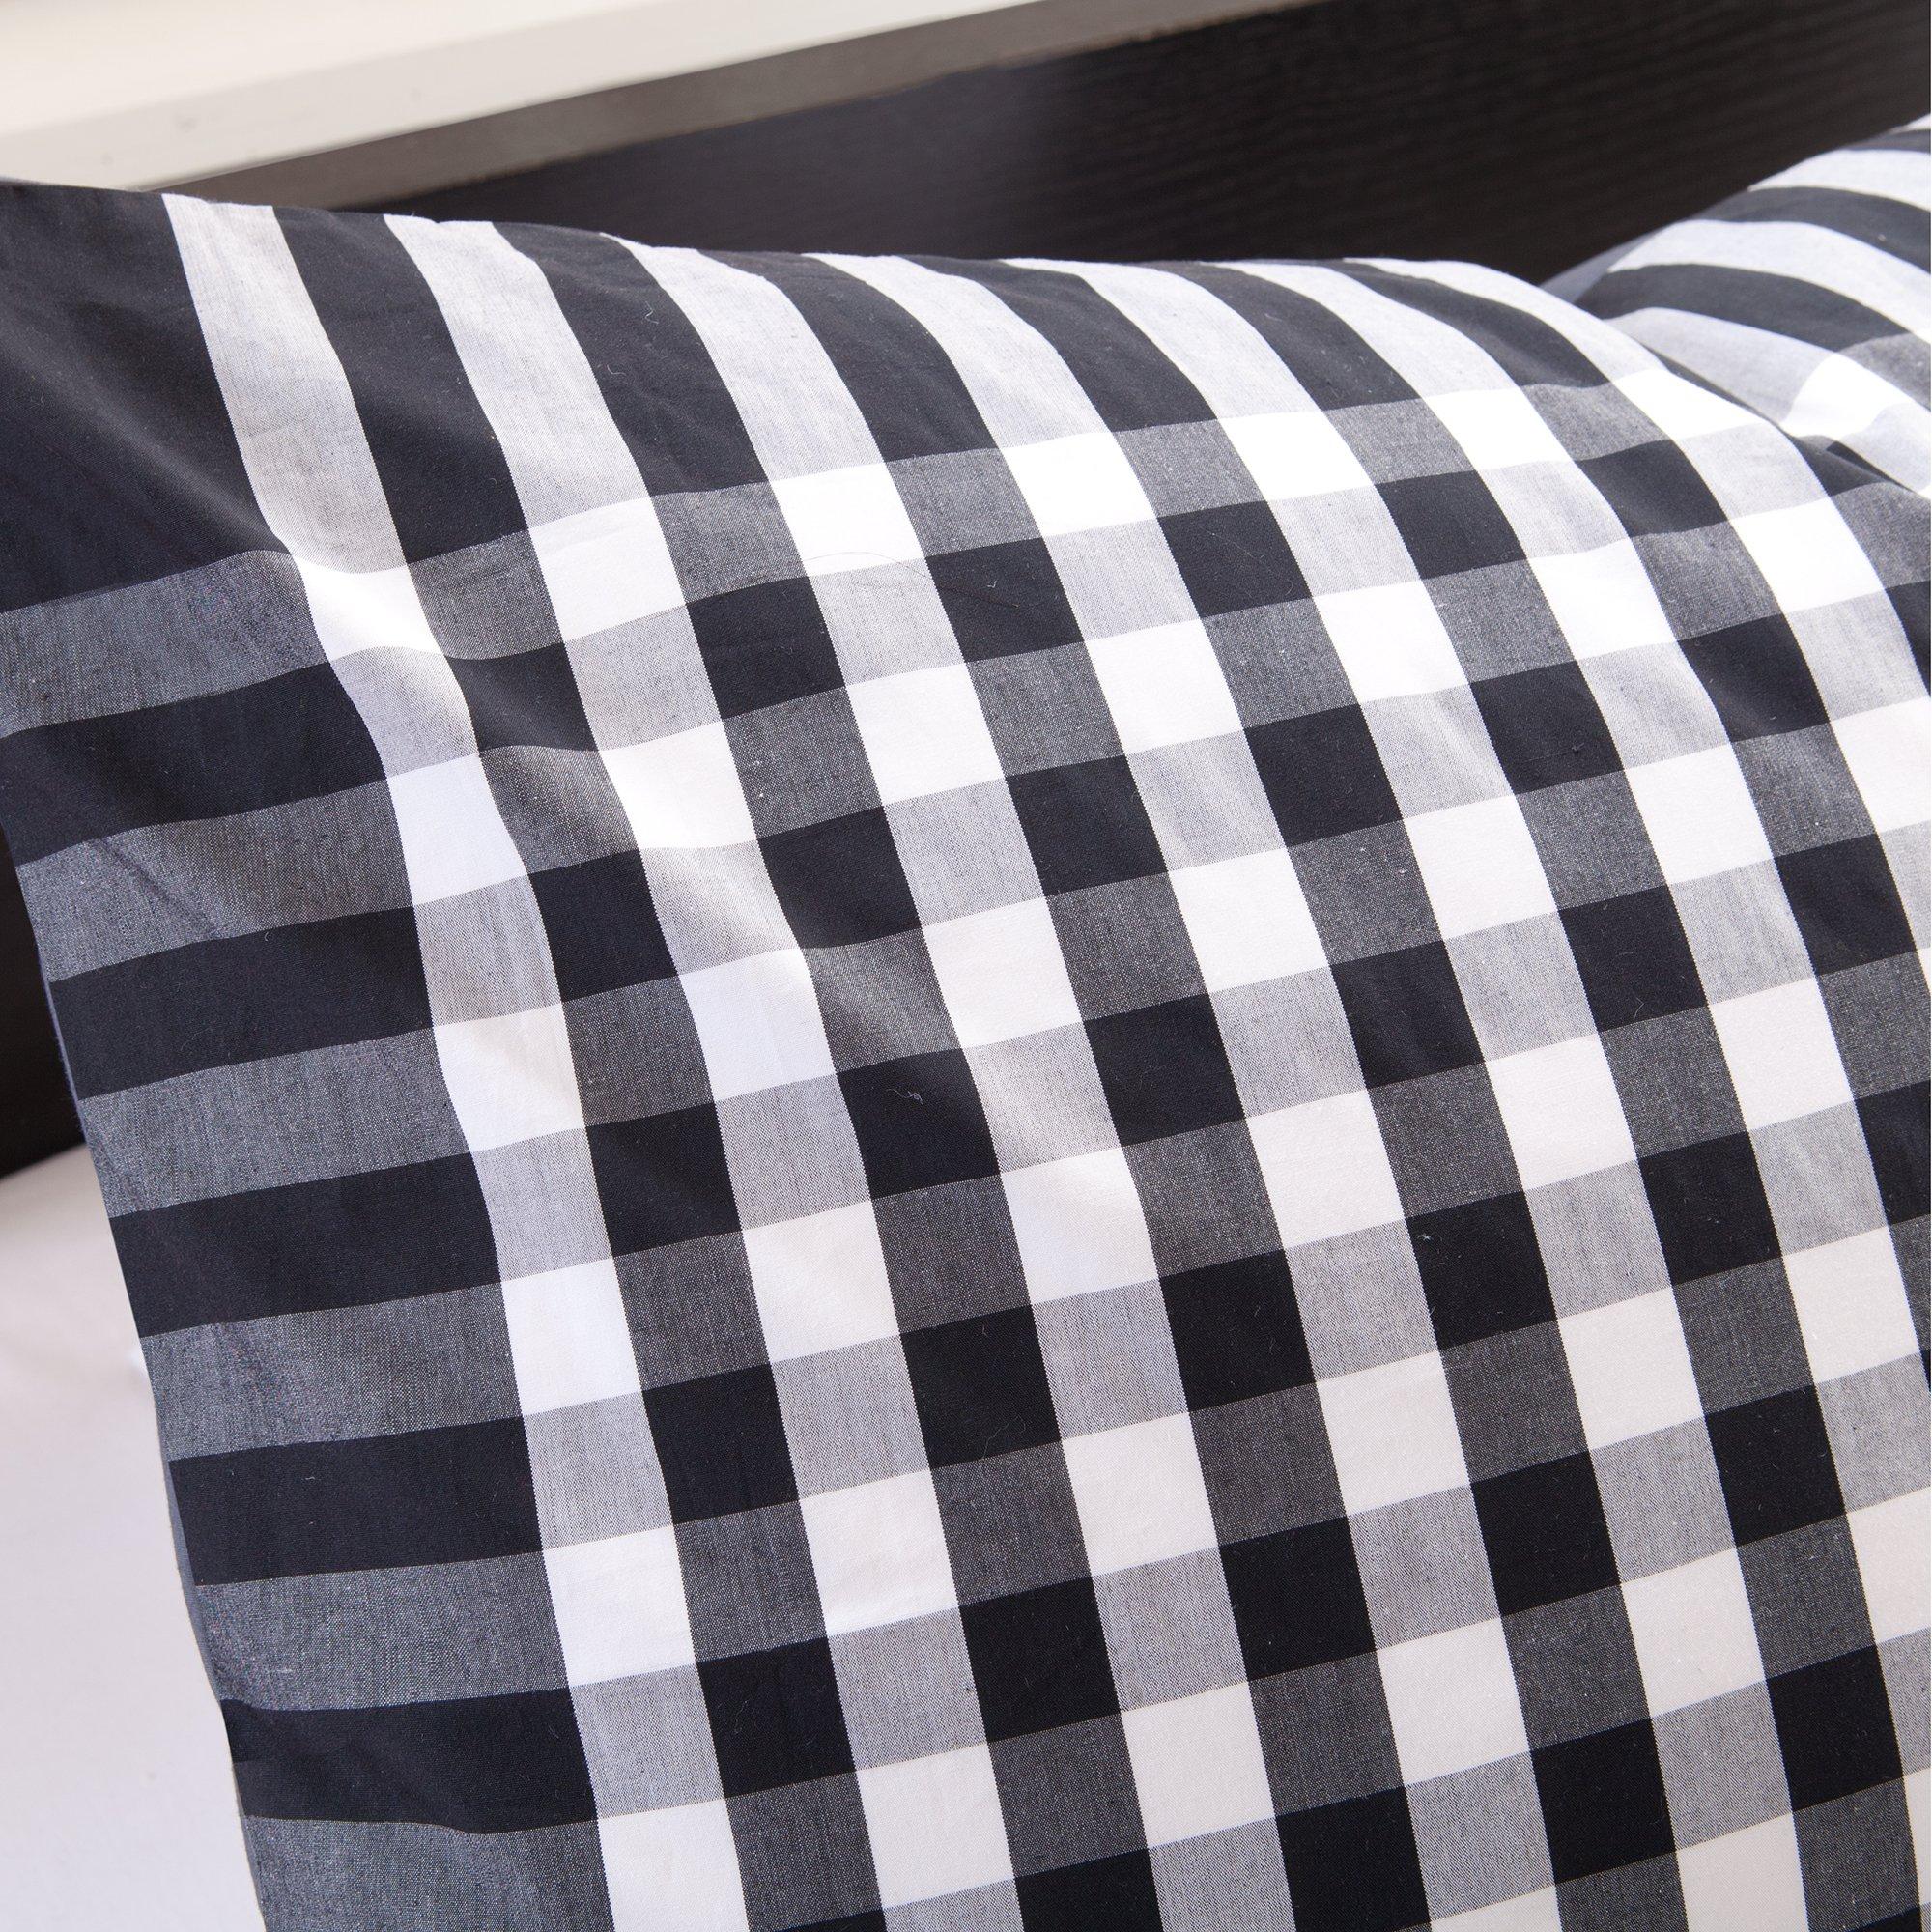 Ink+Ivy Blake 3-Piece Comforter Set, Full/Queen, Black by Ink+Ivy (Image #3)